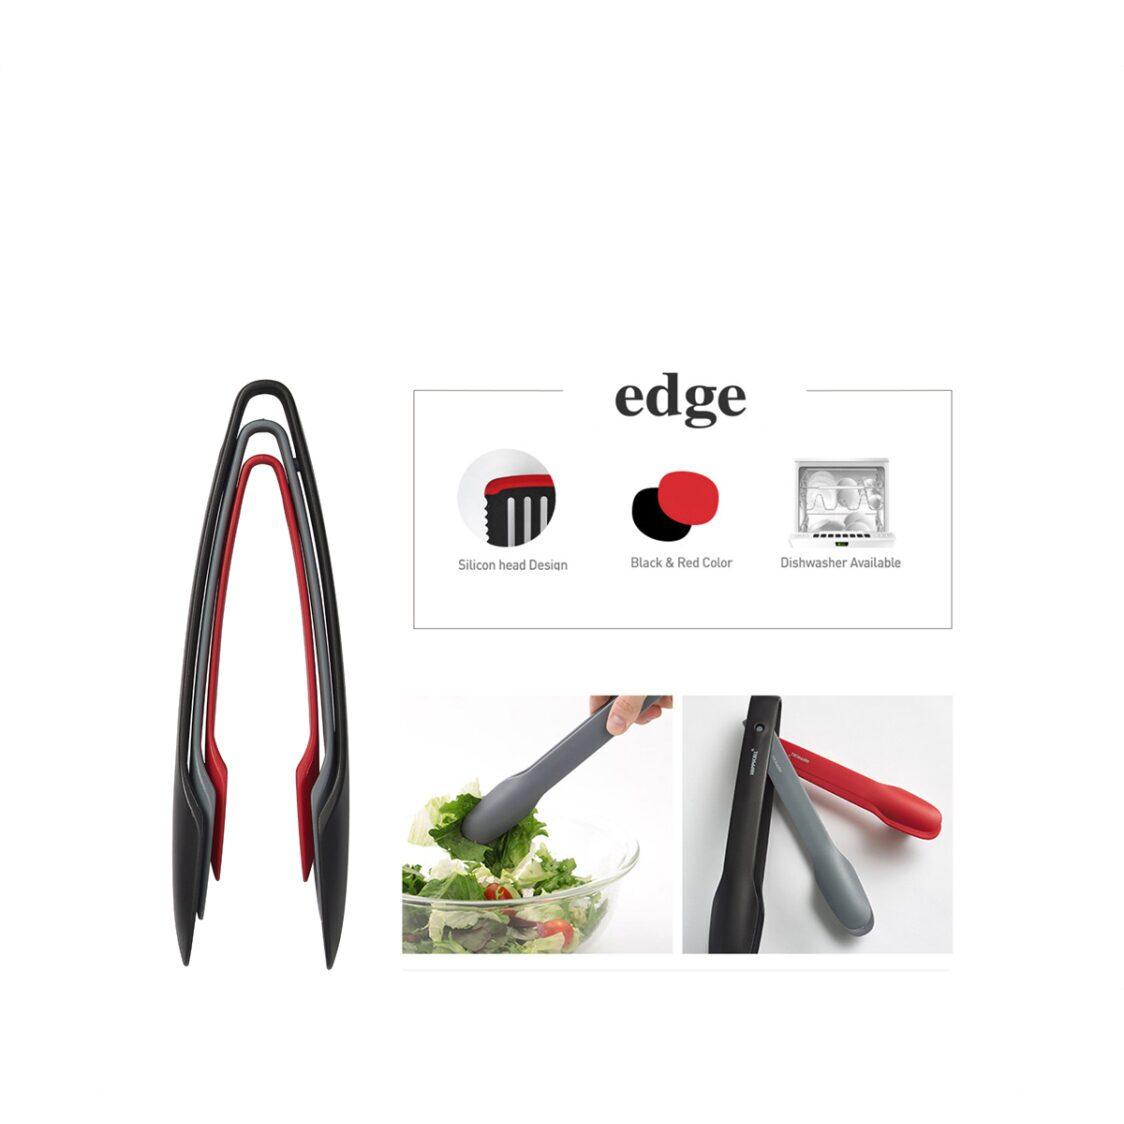 Happycall Edge Salad Tongs 4004-1006